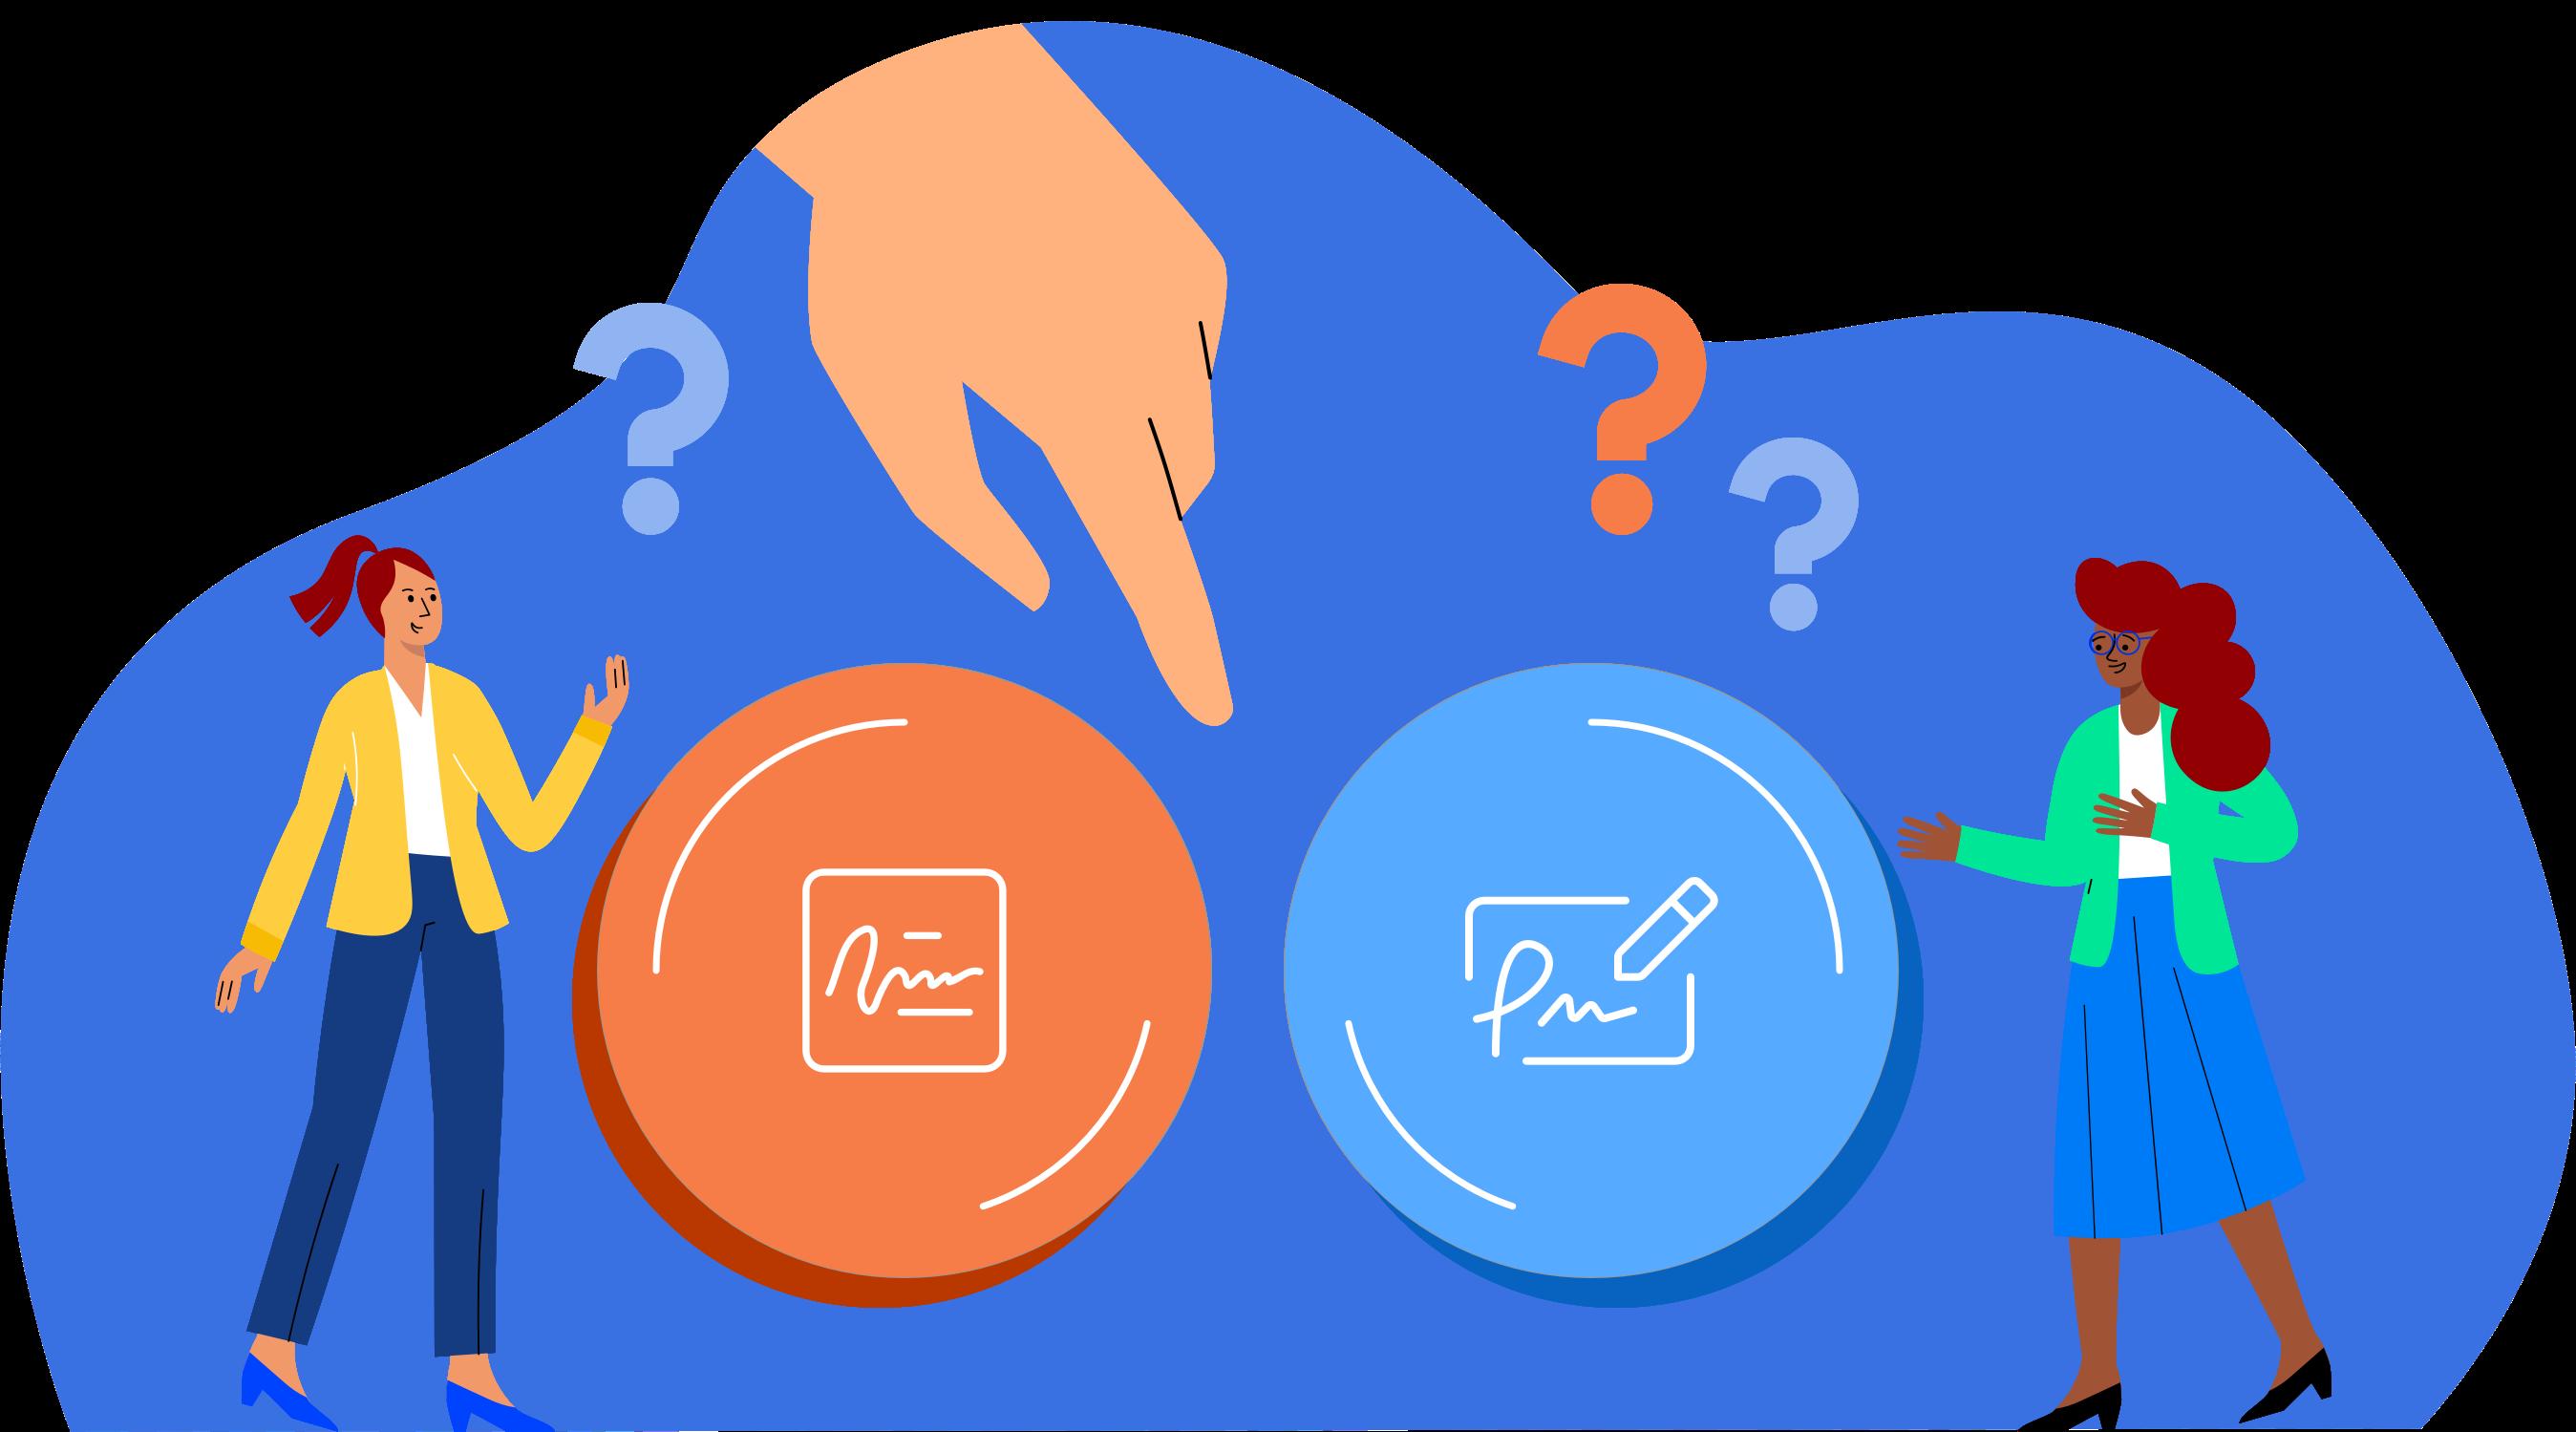 Comparisons SignRequest vs other signing softwares